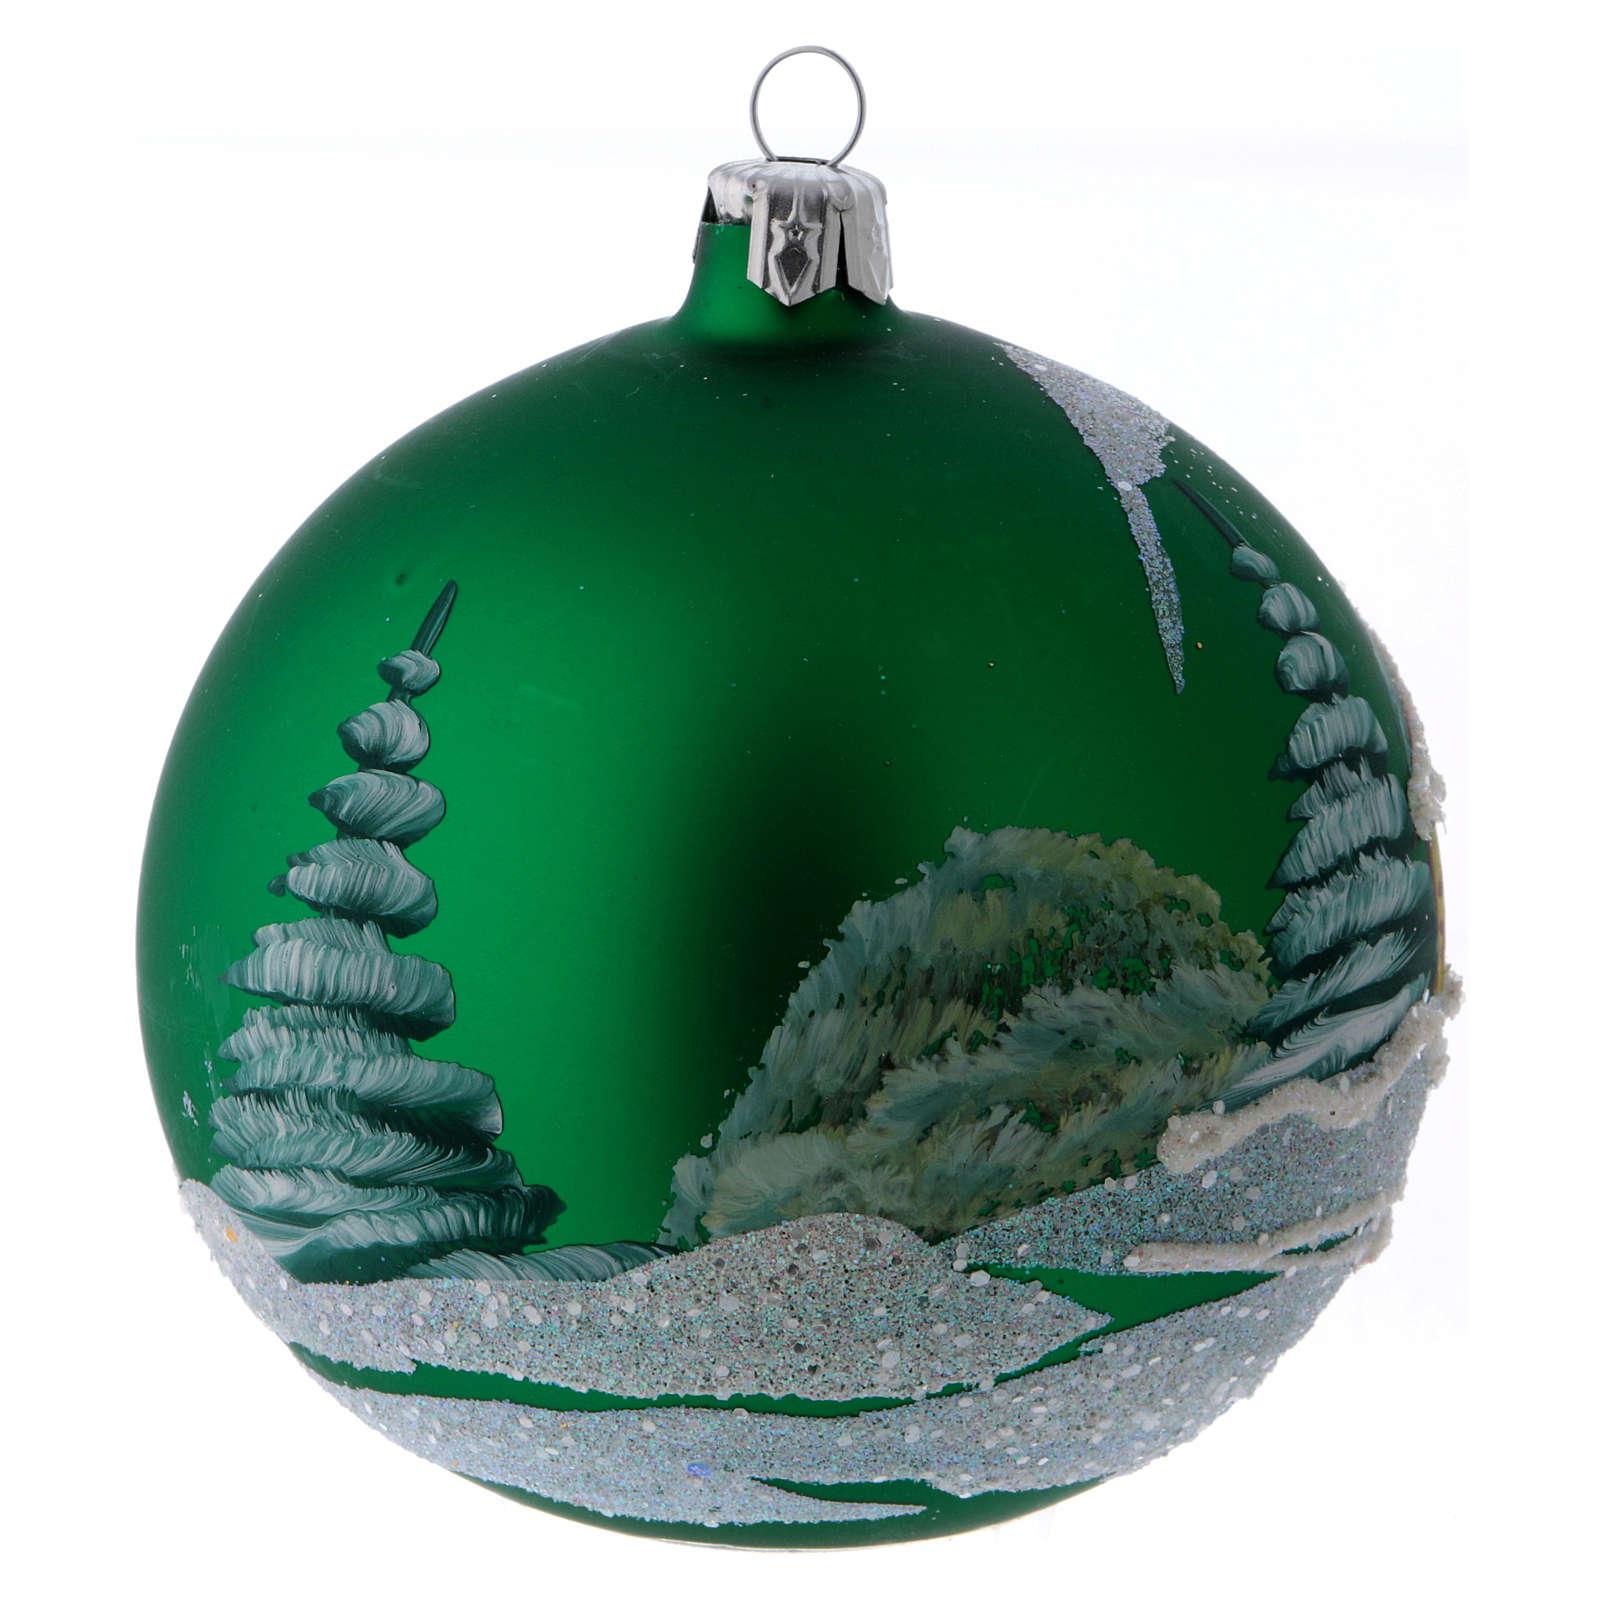 Pallina Albero vetro verde baita scandinava innevata 100 mm 4